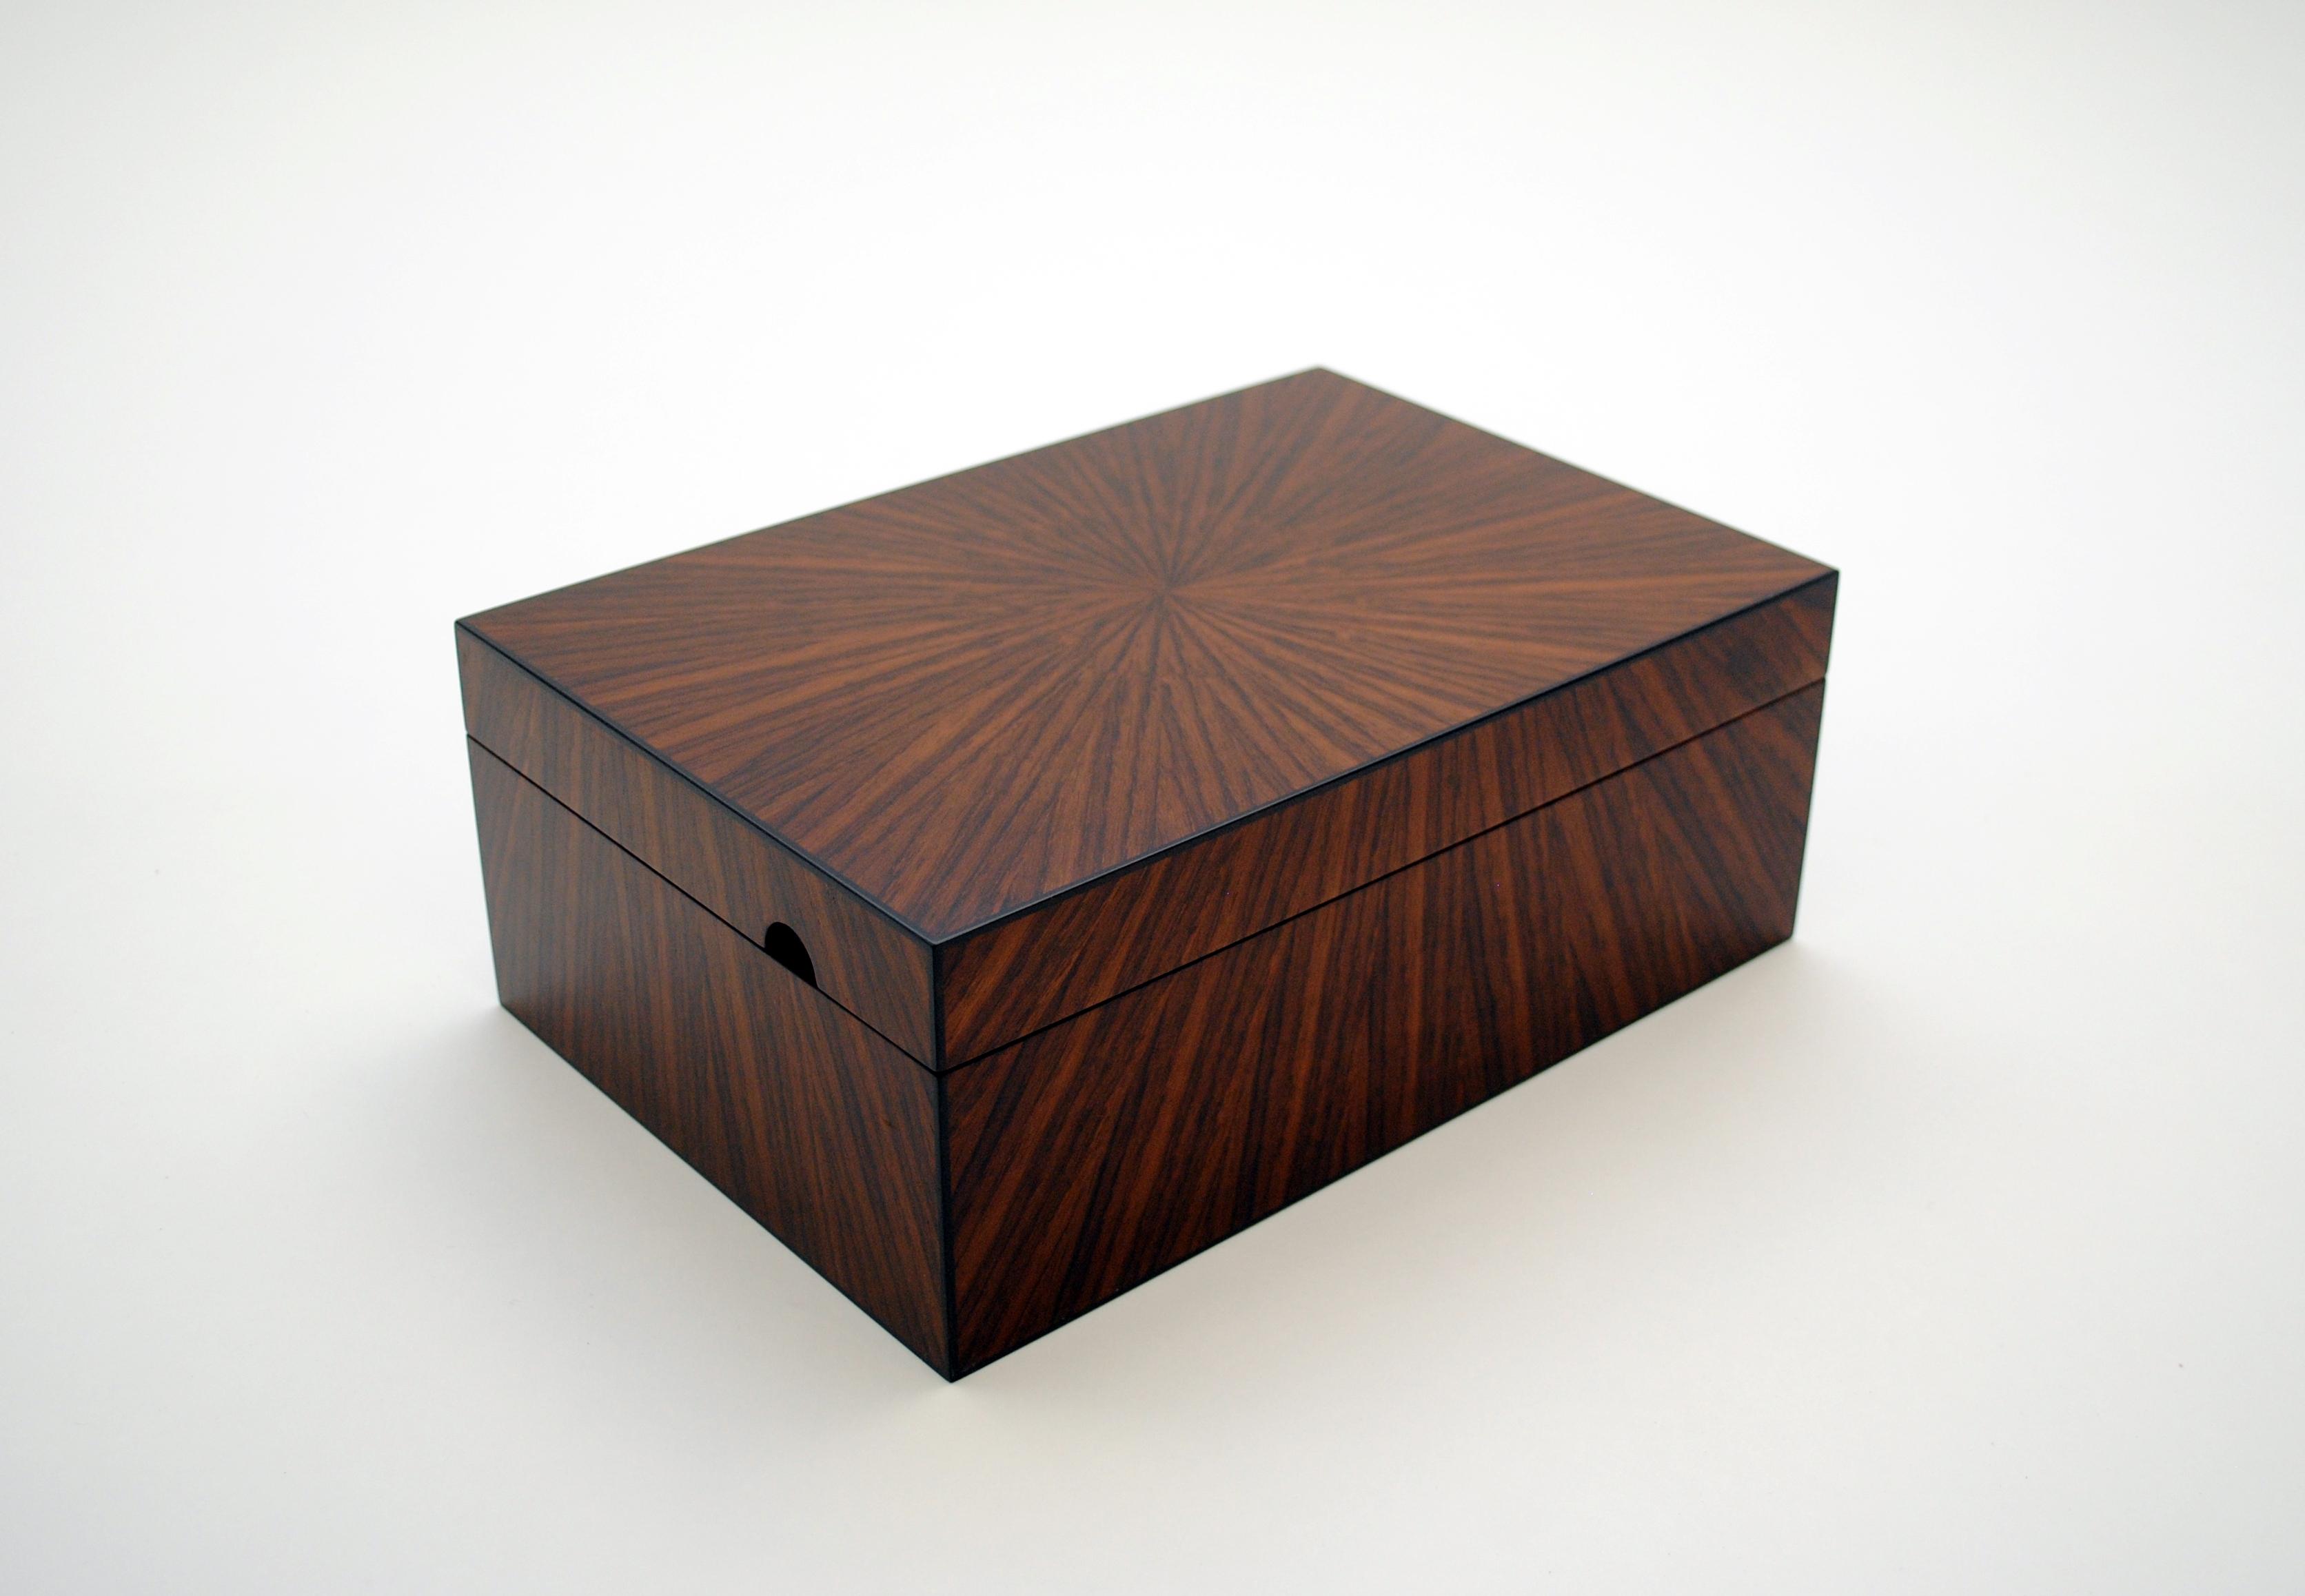 The jewell jewellery Box by Edward Wild